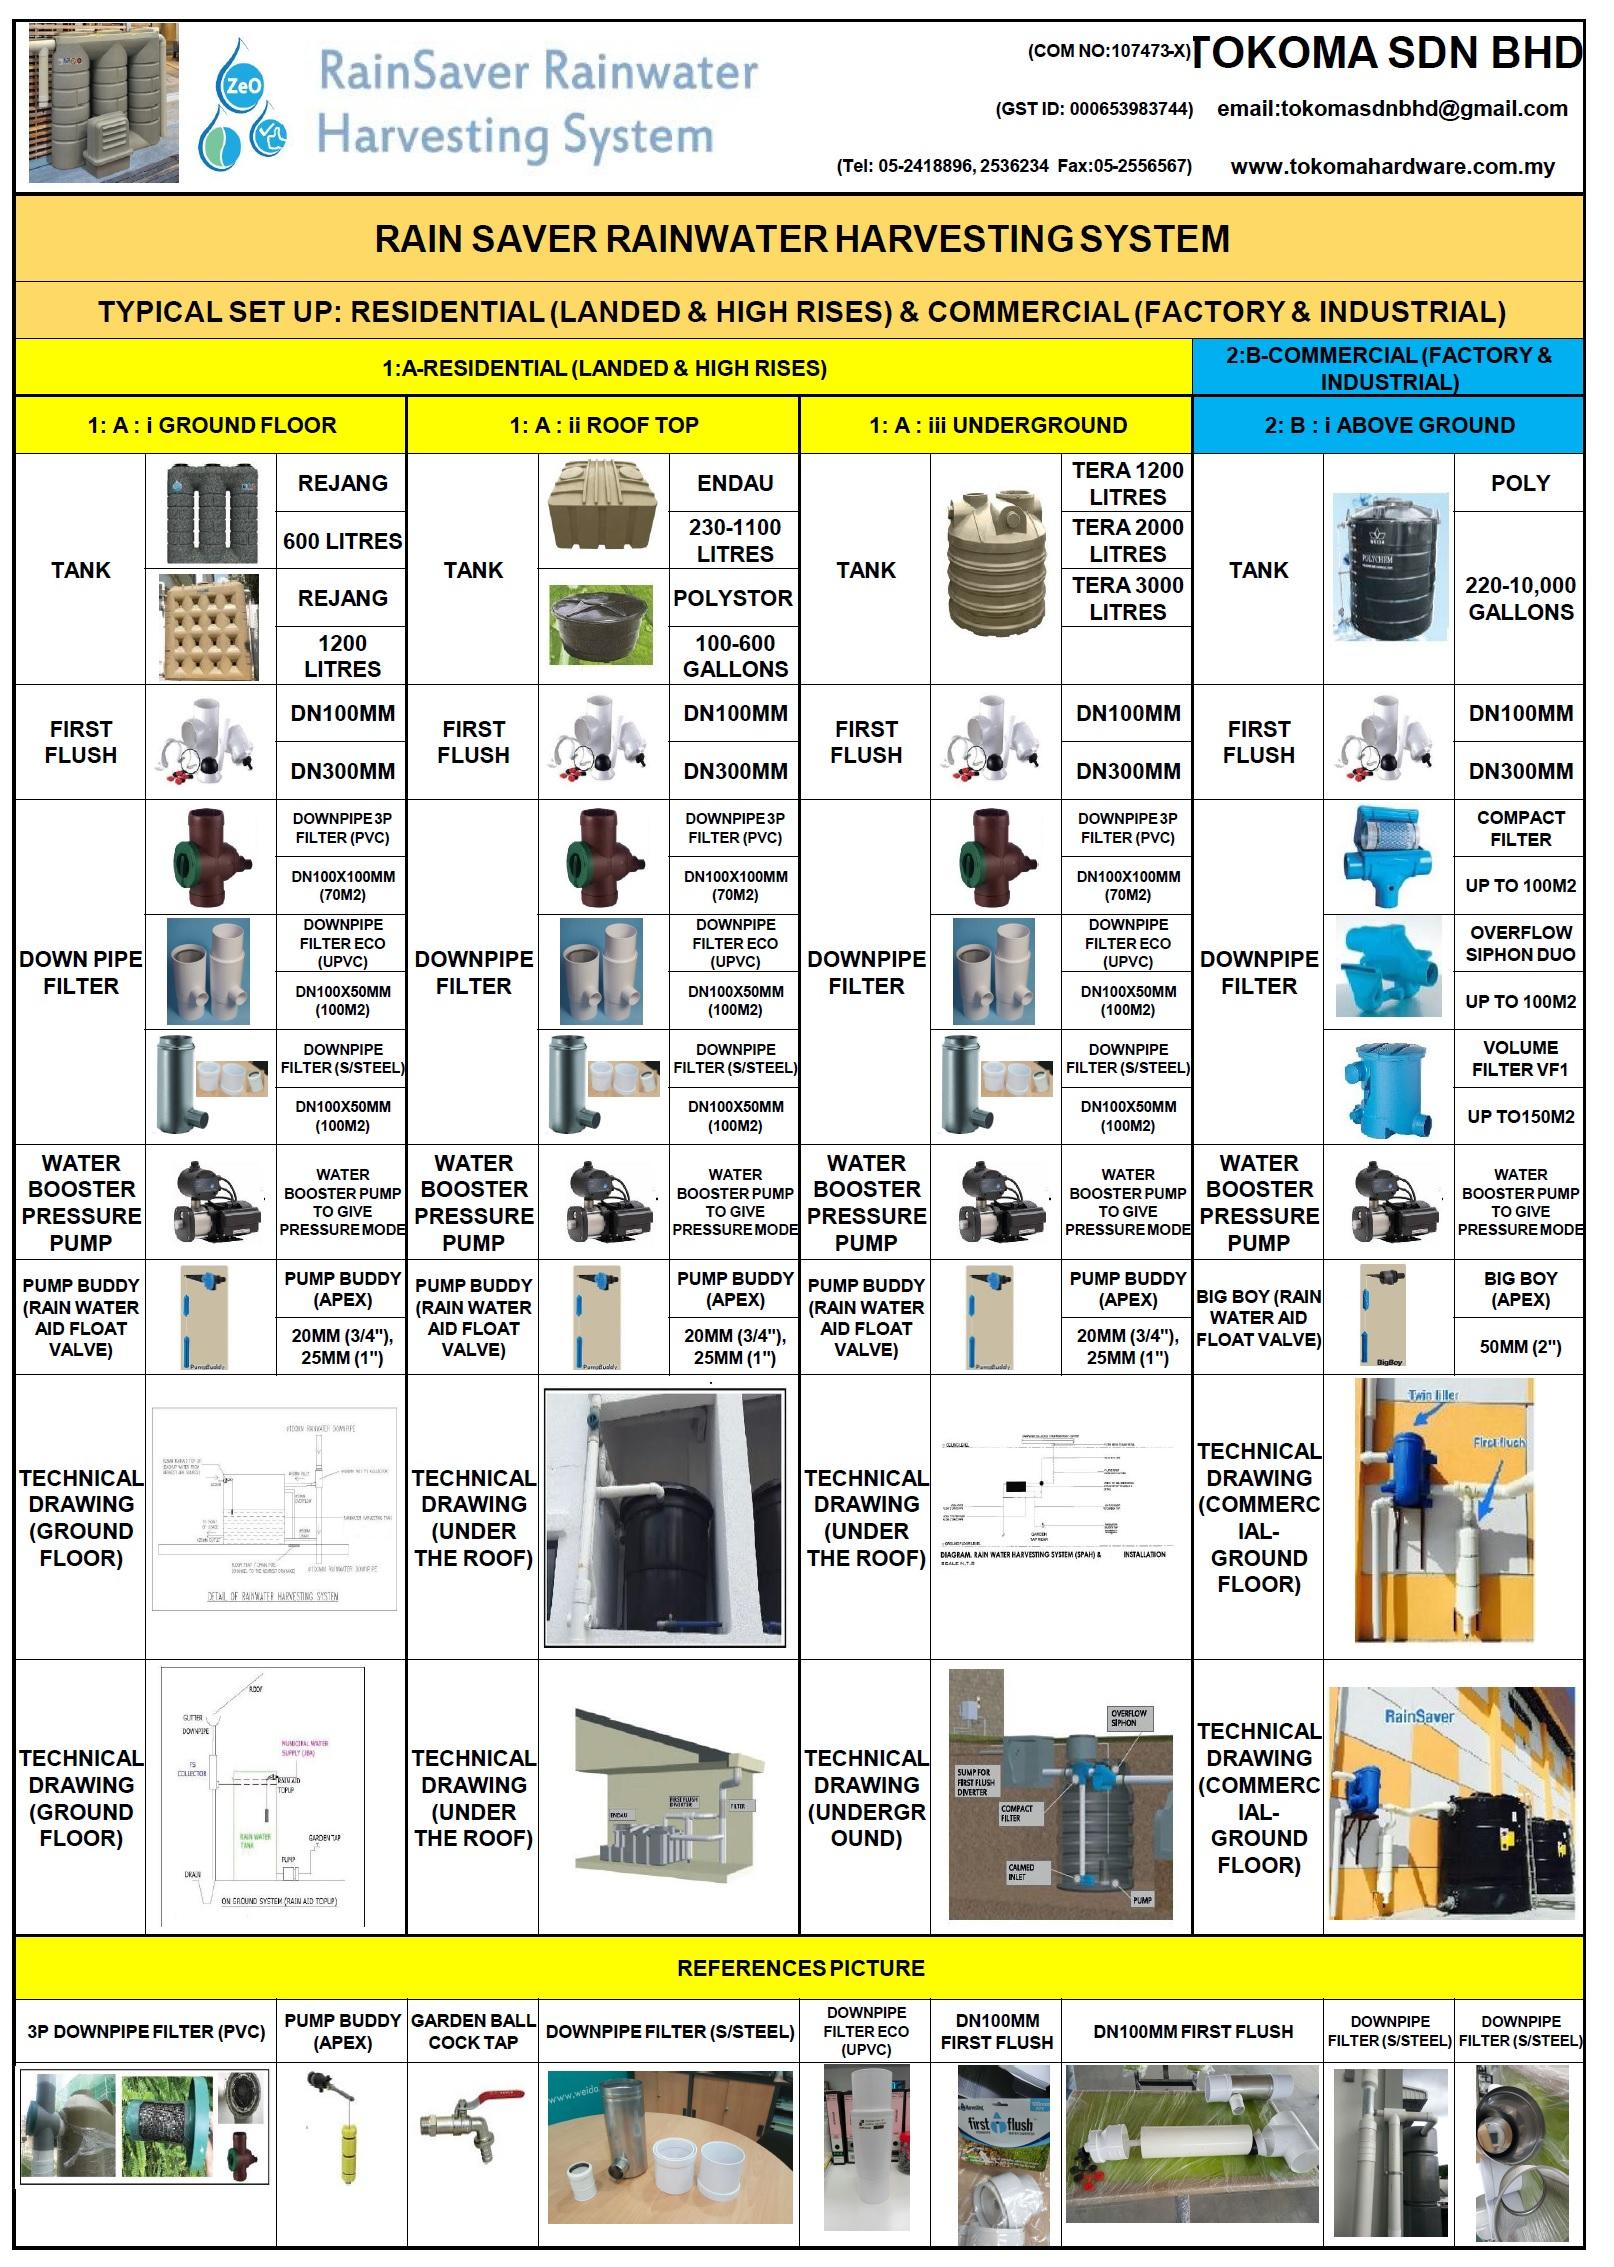 rainwater harvesting system bessrain system Malaysia rain saver (rain water harvesting system)  bessrain:  bacfree grundfos: rain water harvesting system water.